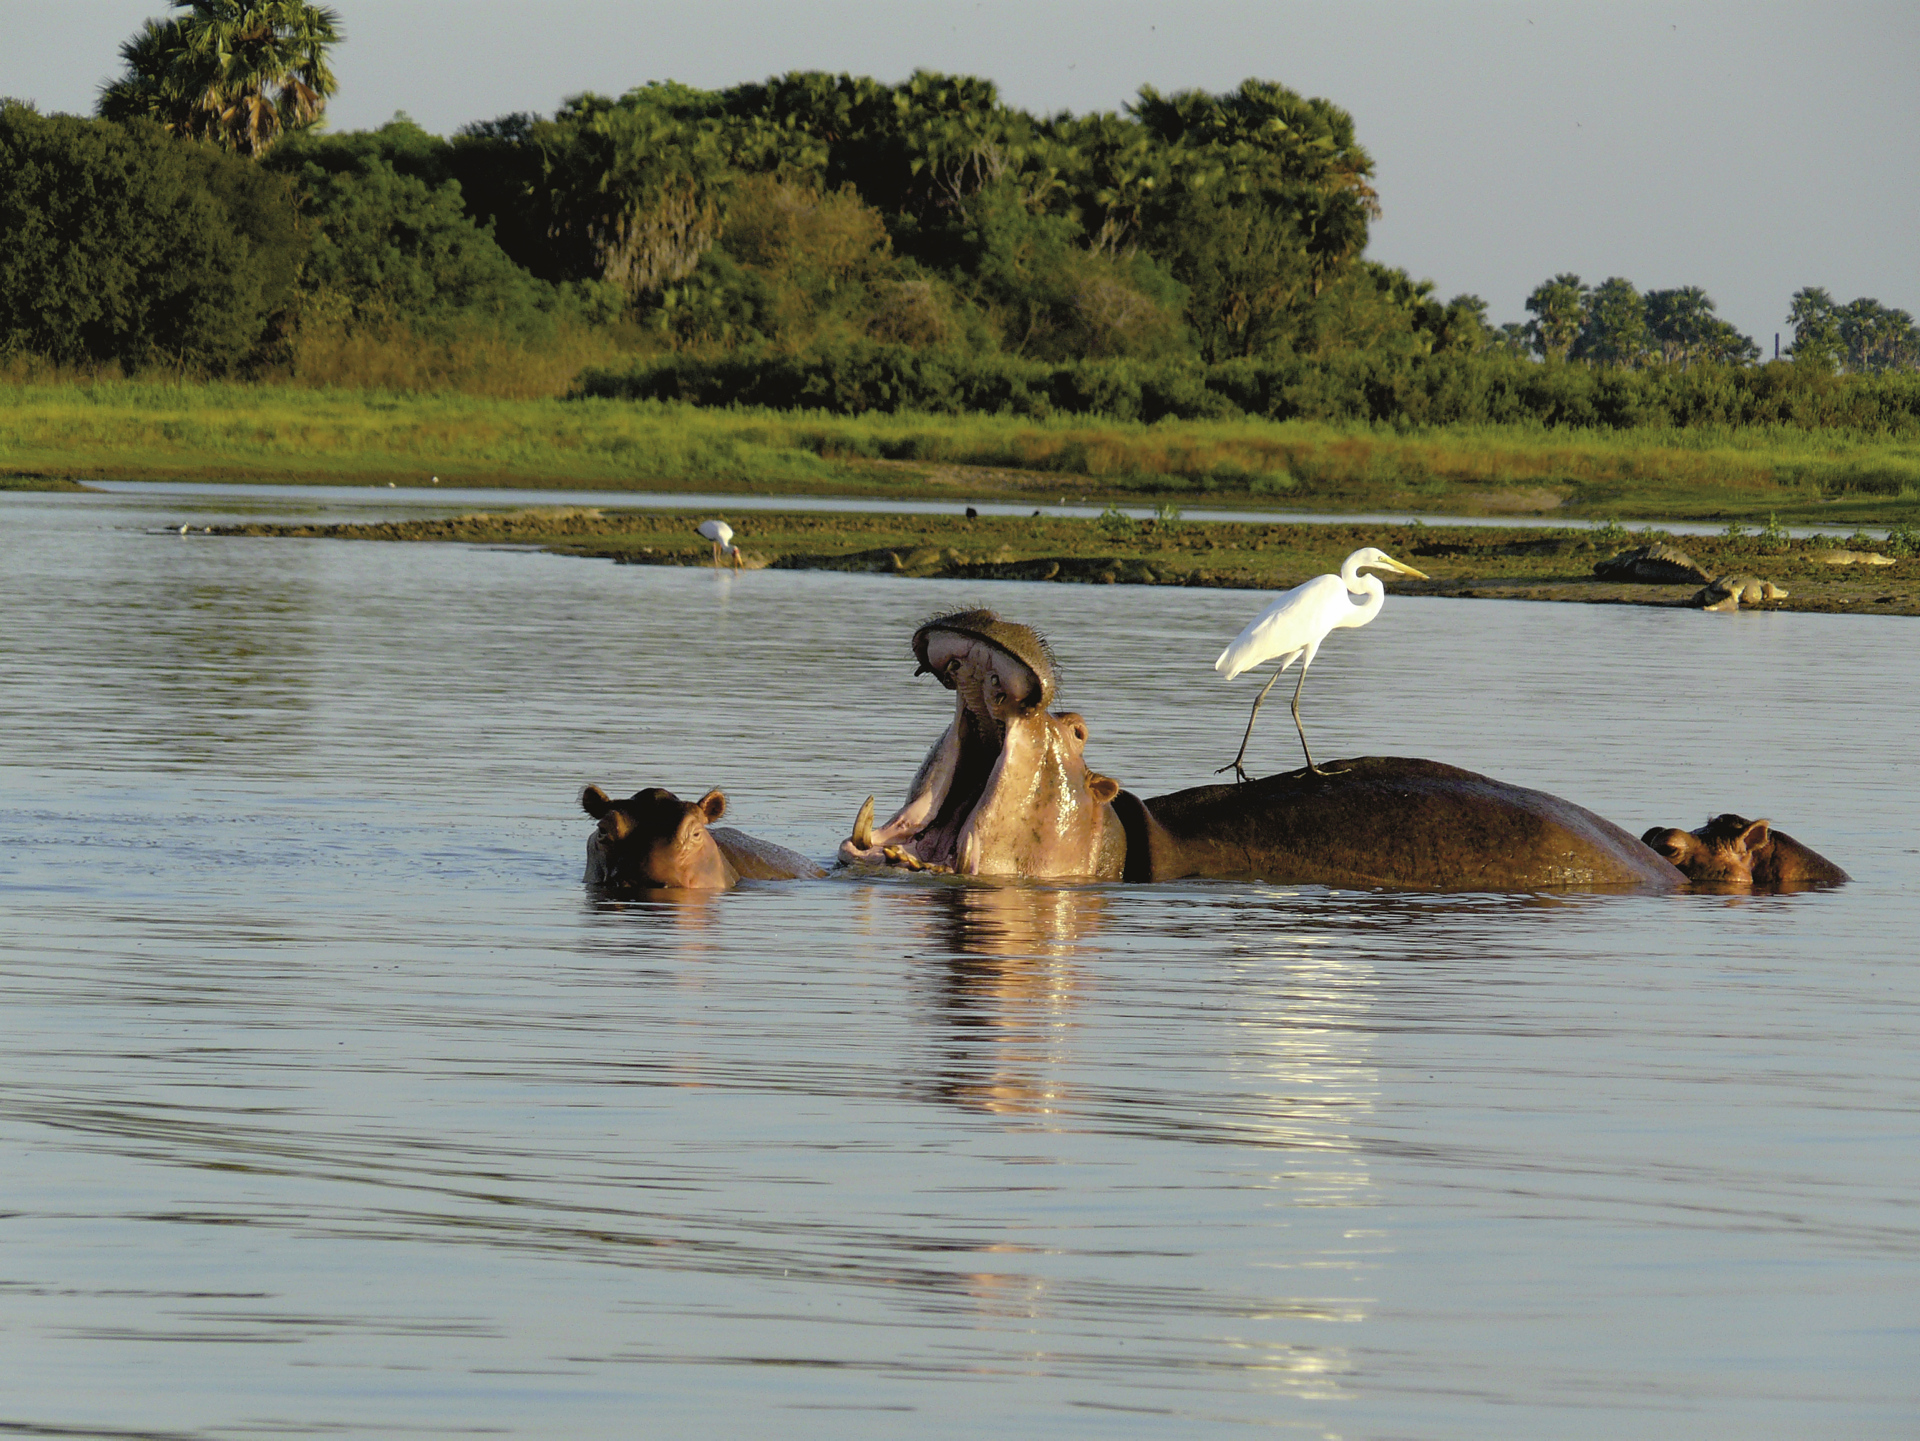 © Heiko Schierz; Im Selous Game Reserve